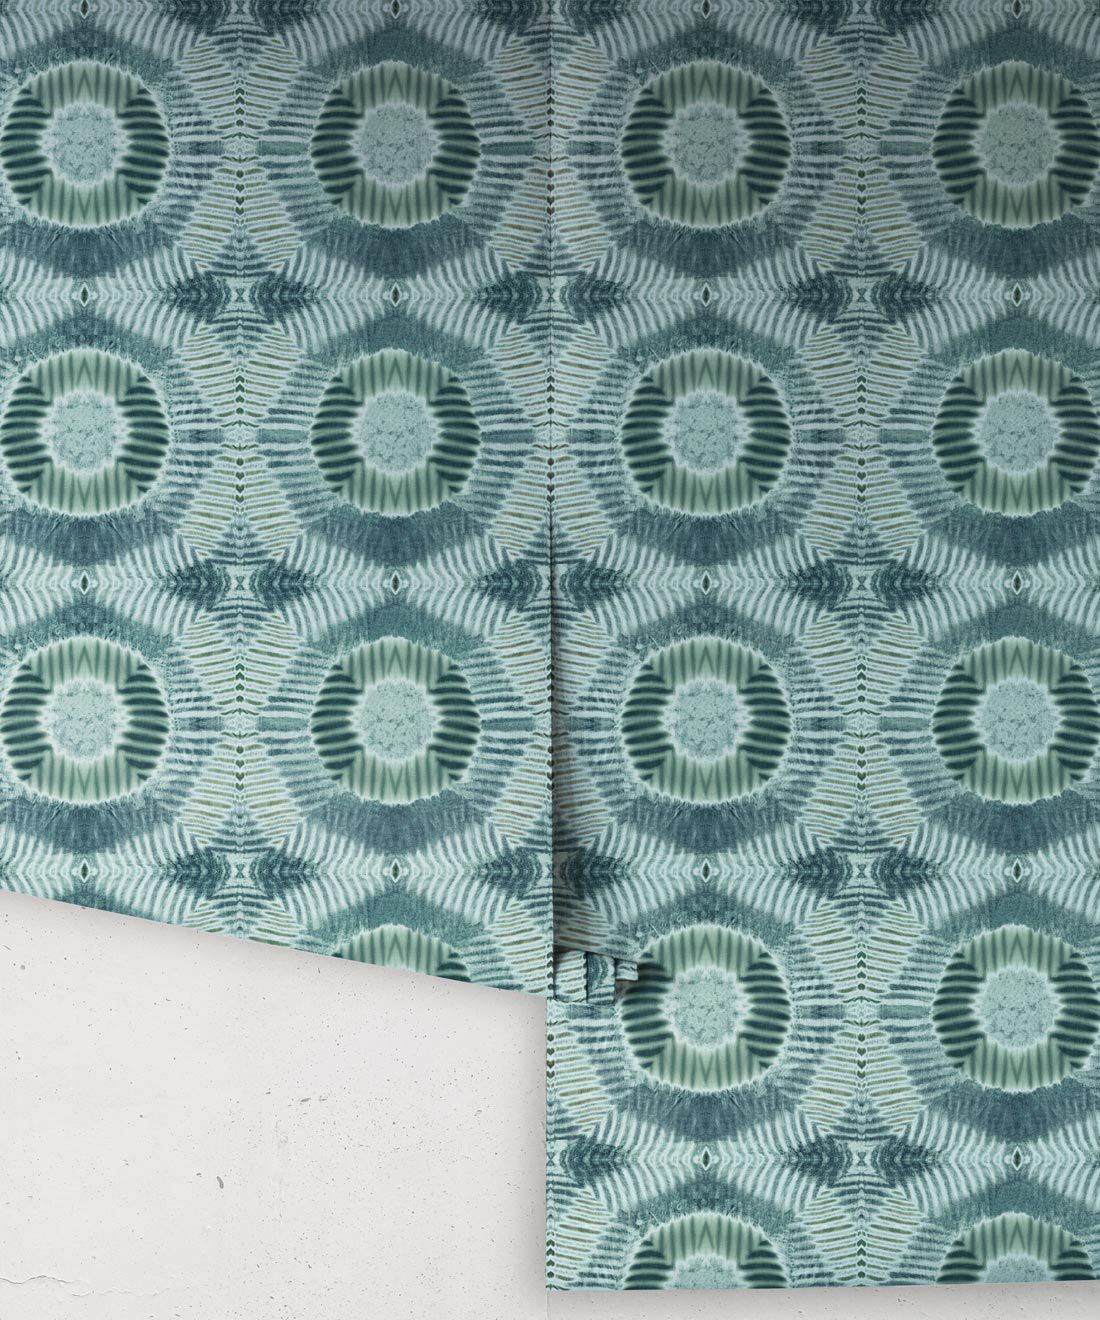 Aztec Suns Wallpaper Sage • Shibori Geometric • Rolls